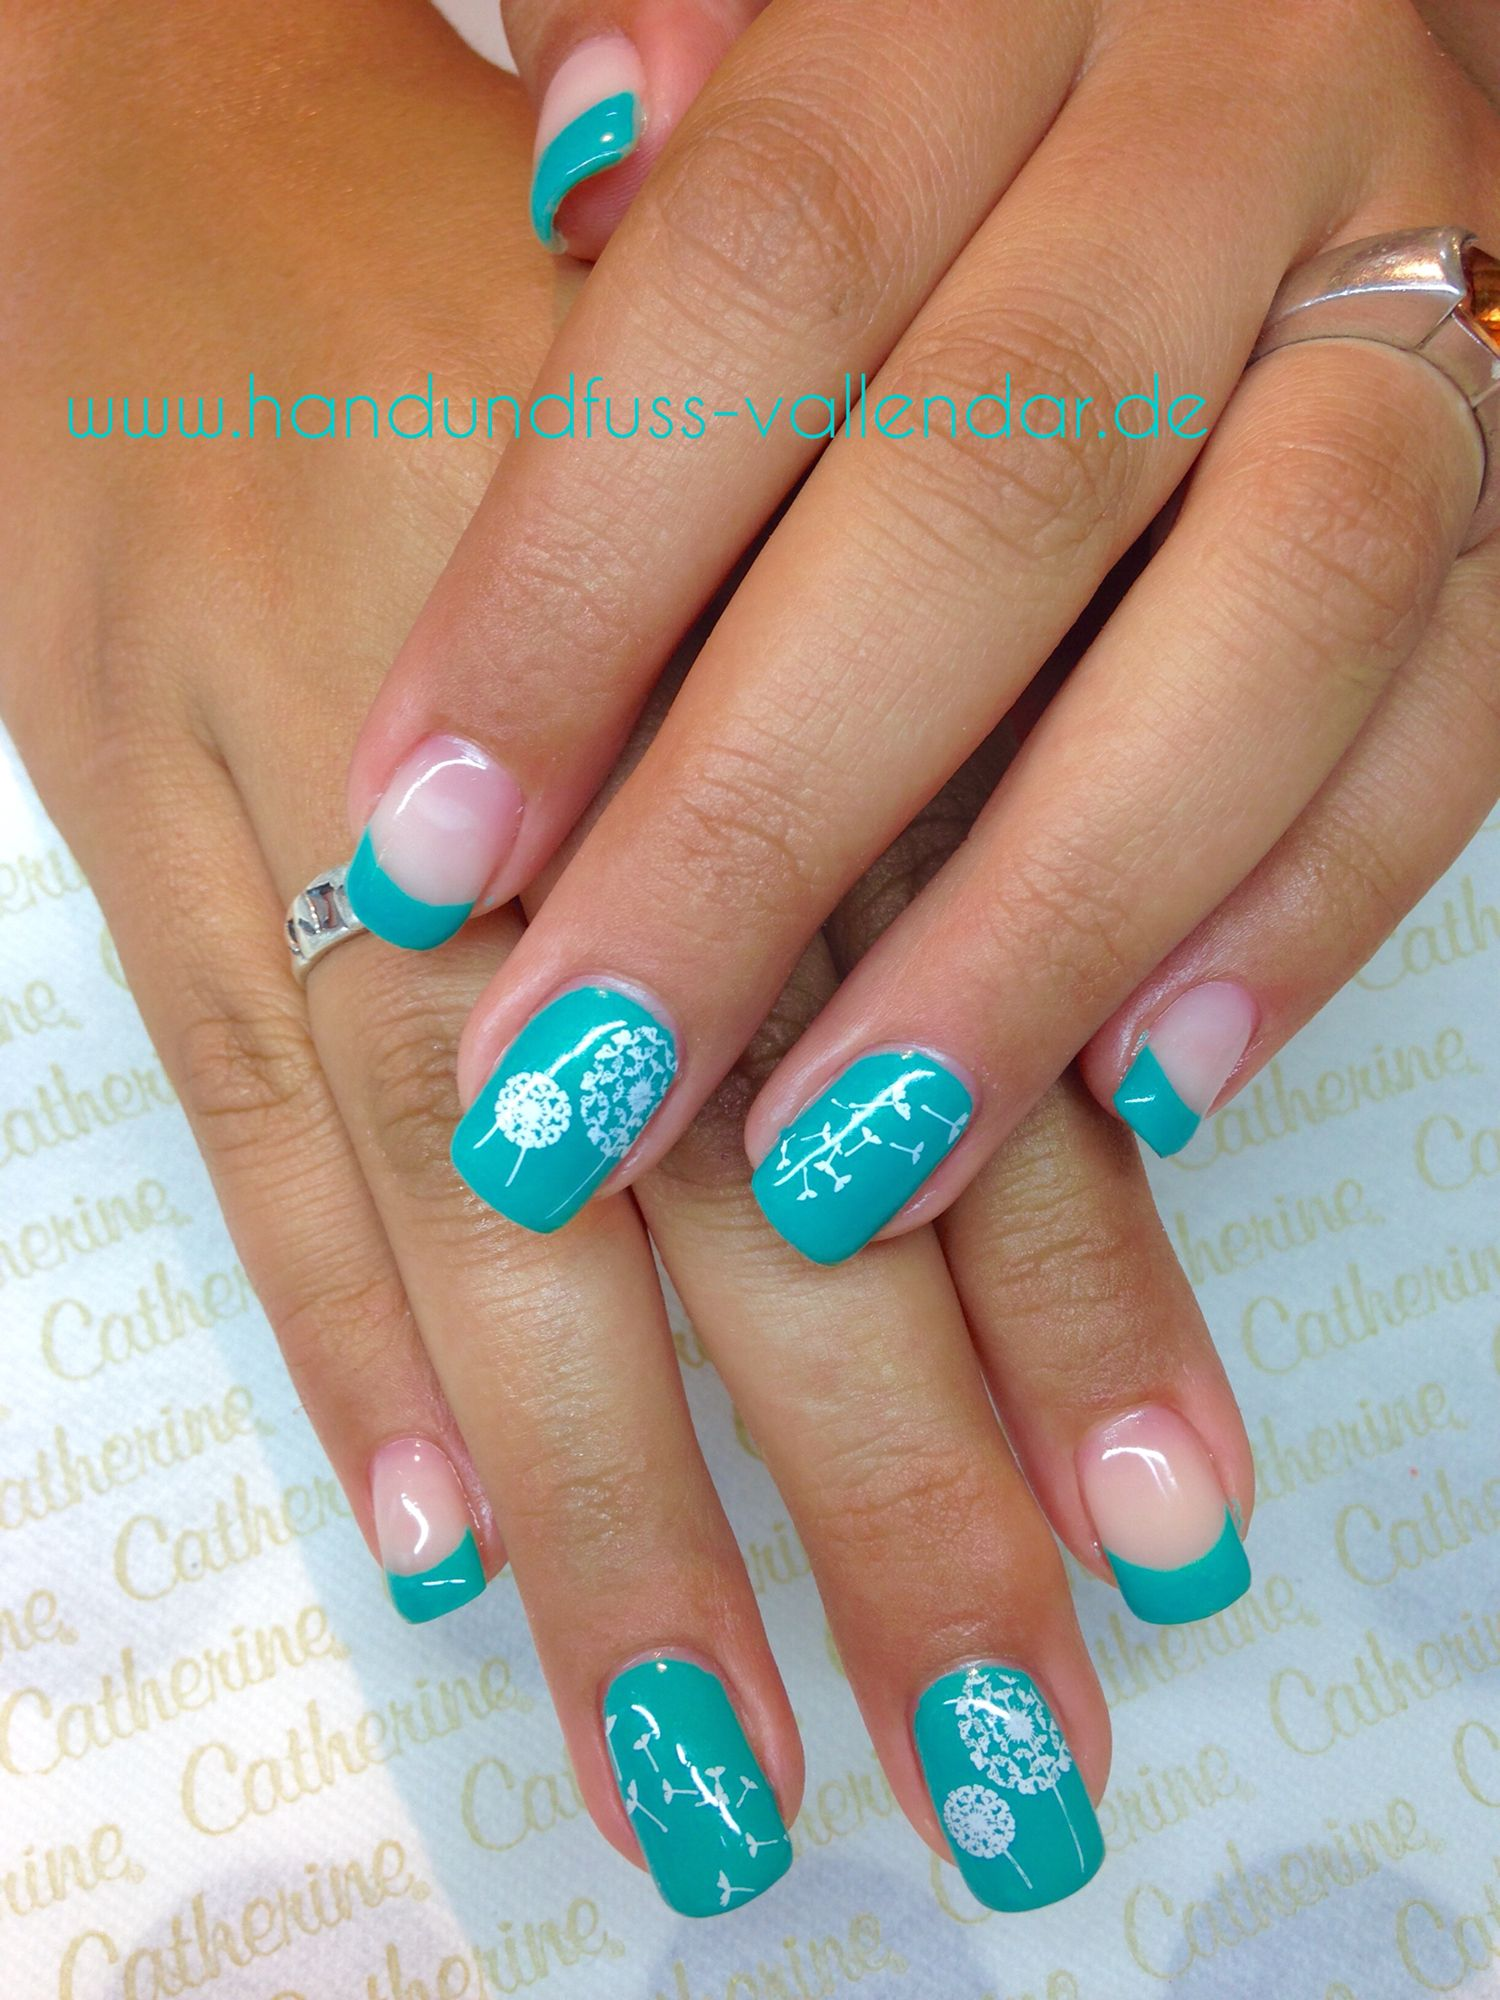 blue #catherine #shellac #cnd #gel #dandilon #design #nailart #hand ...